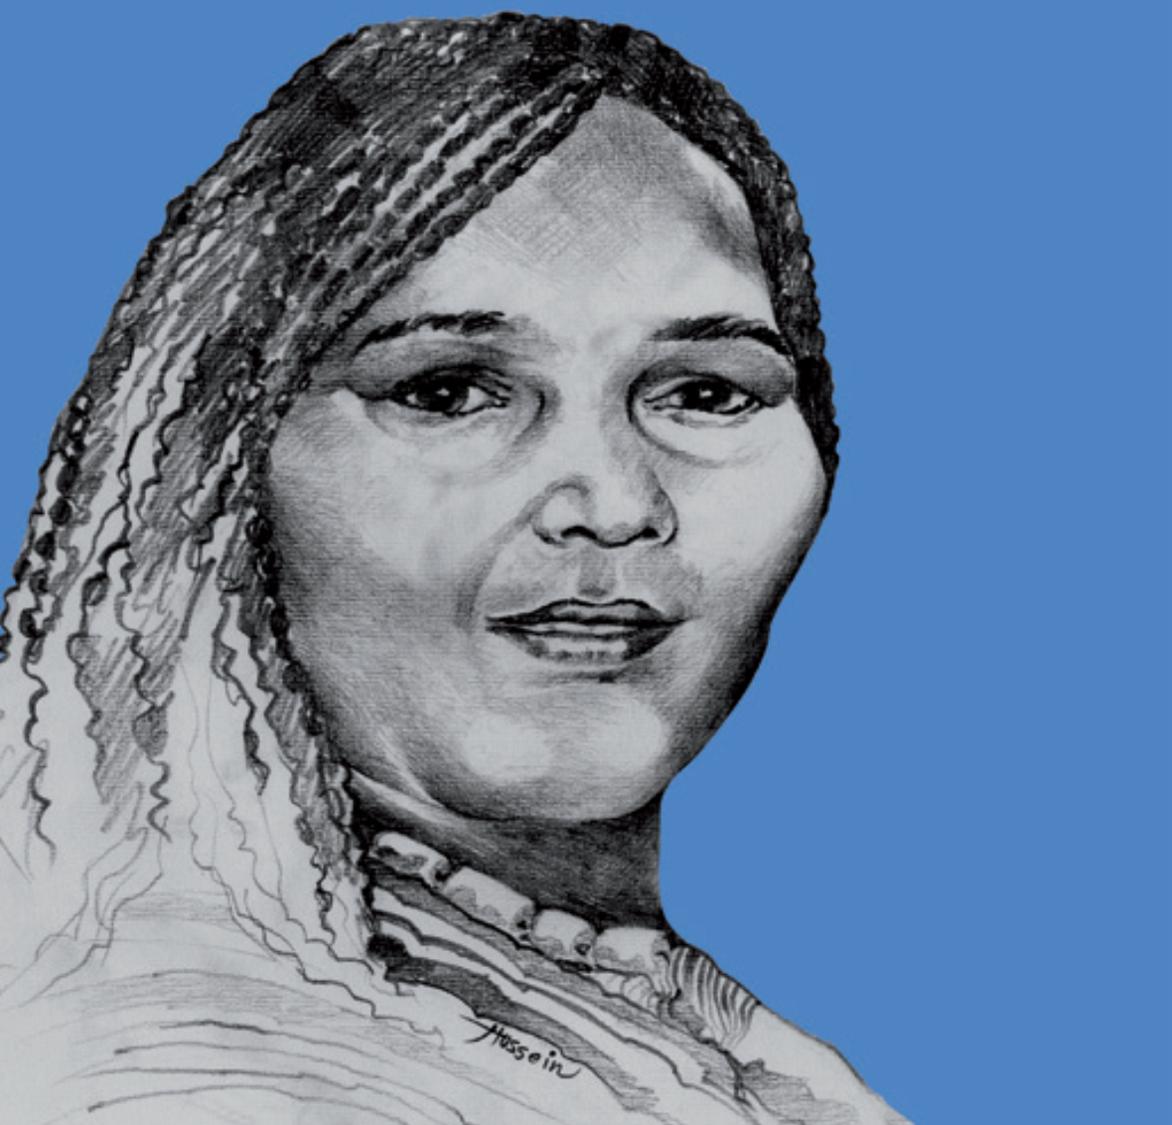 drawing by Hussein Mirghani, Sudan